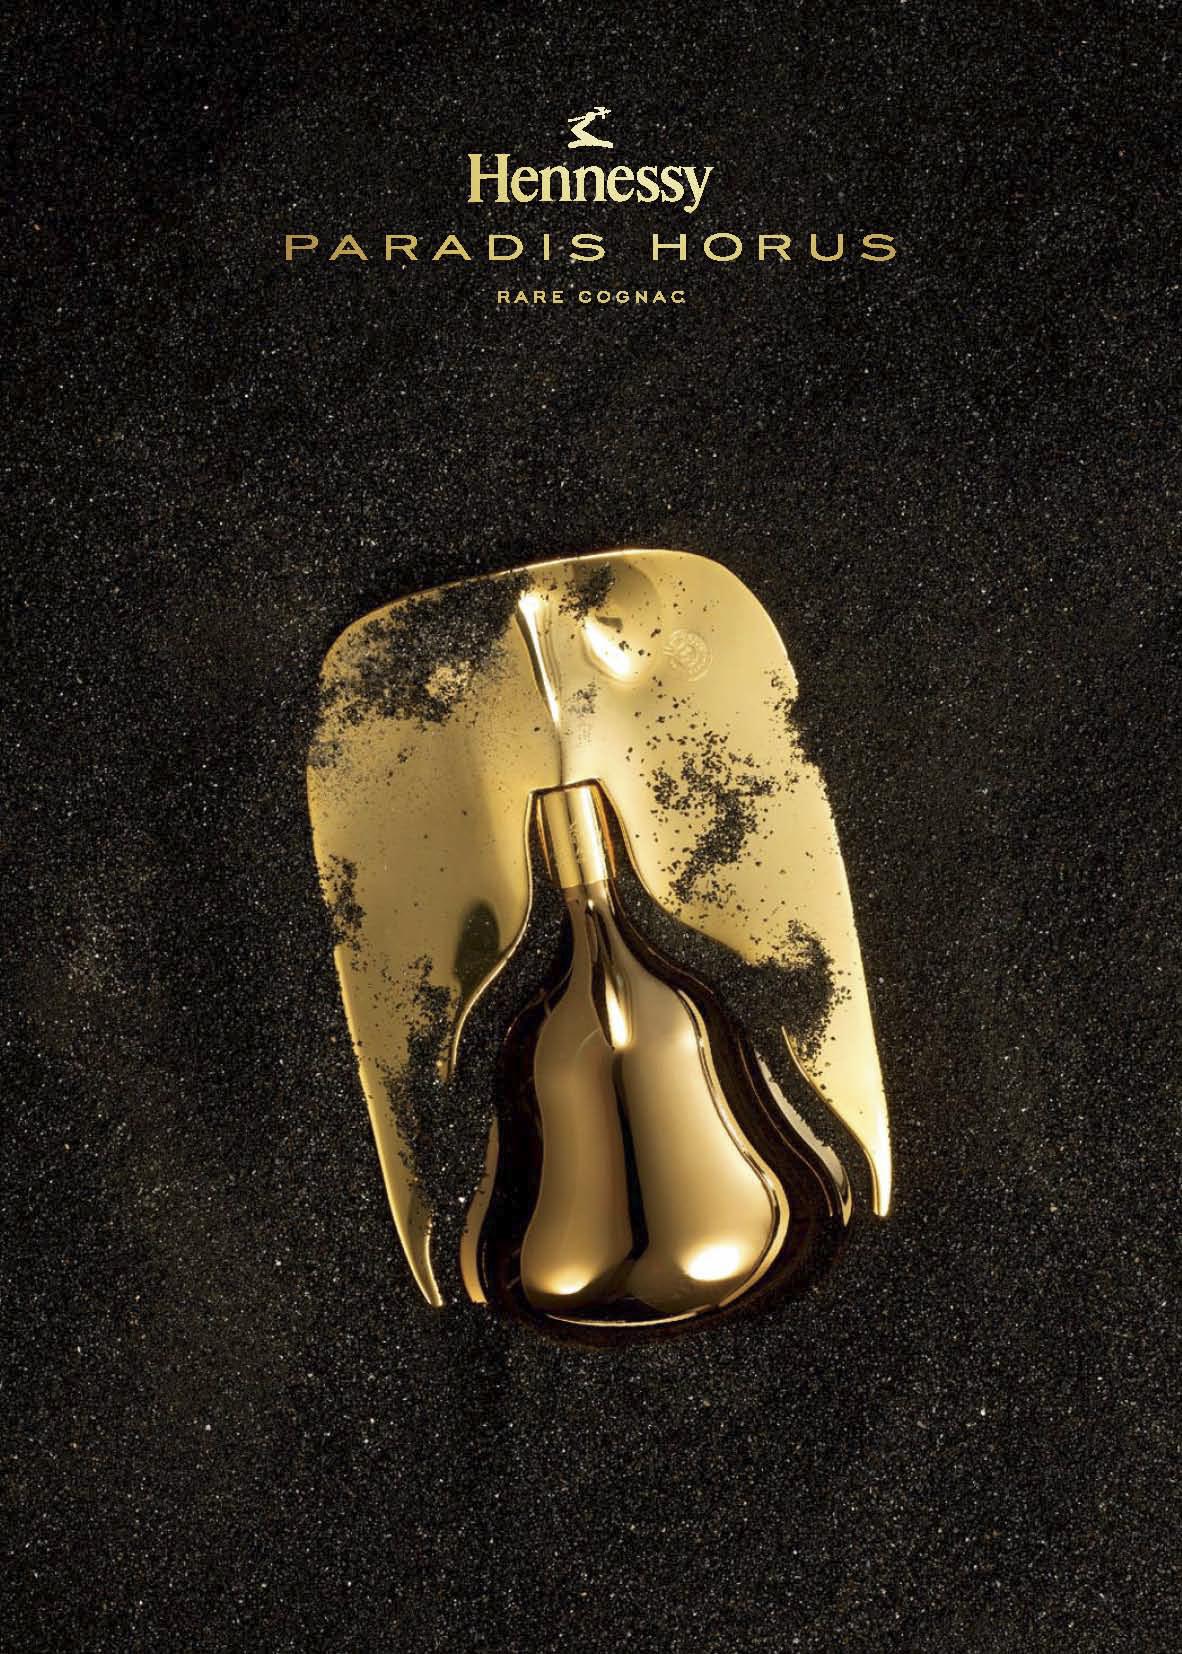 Paradis Horus